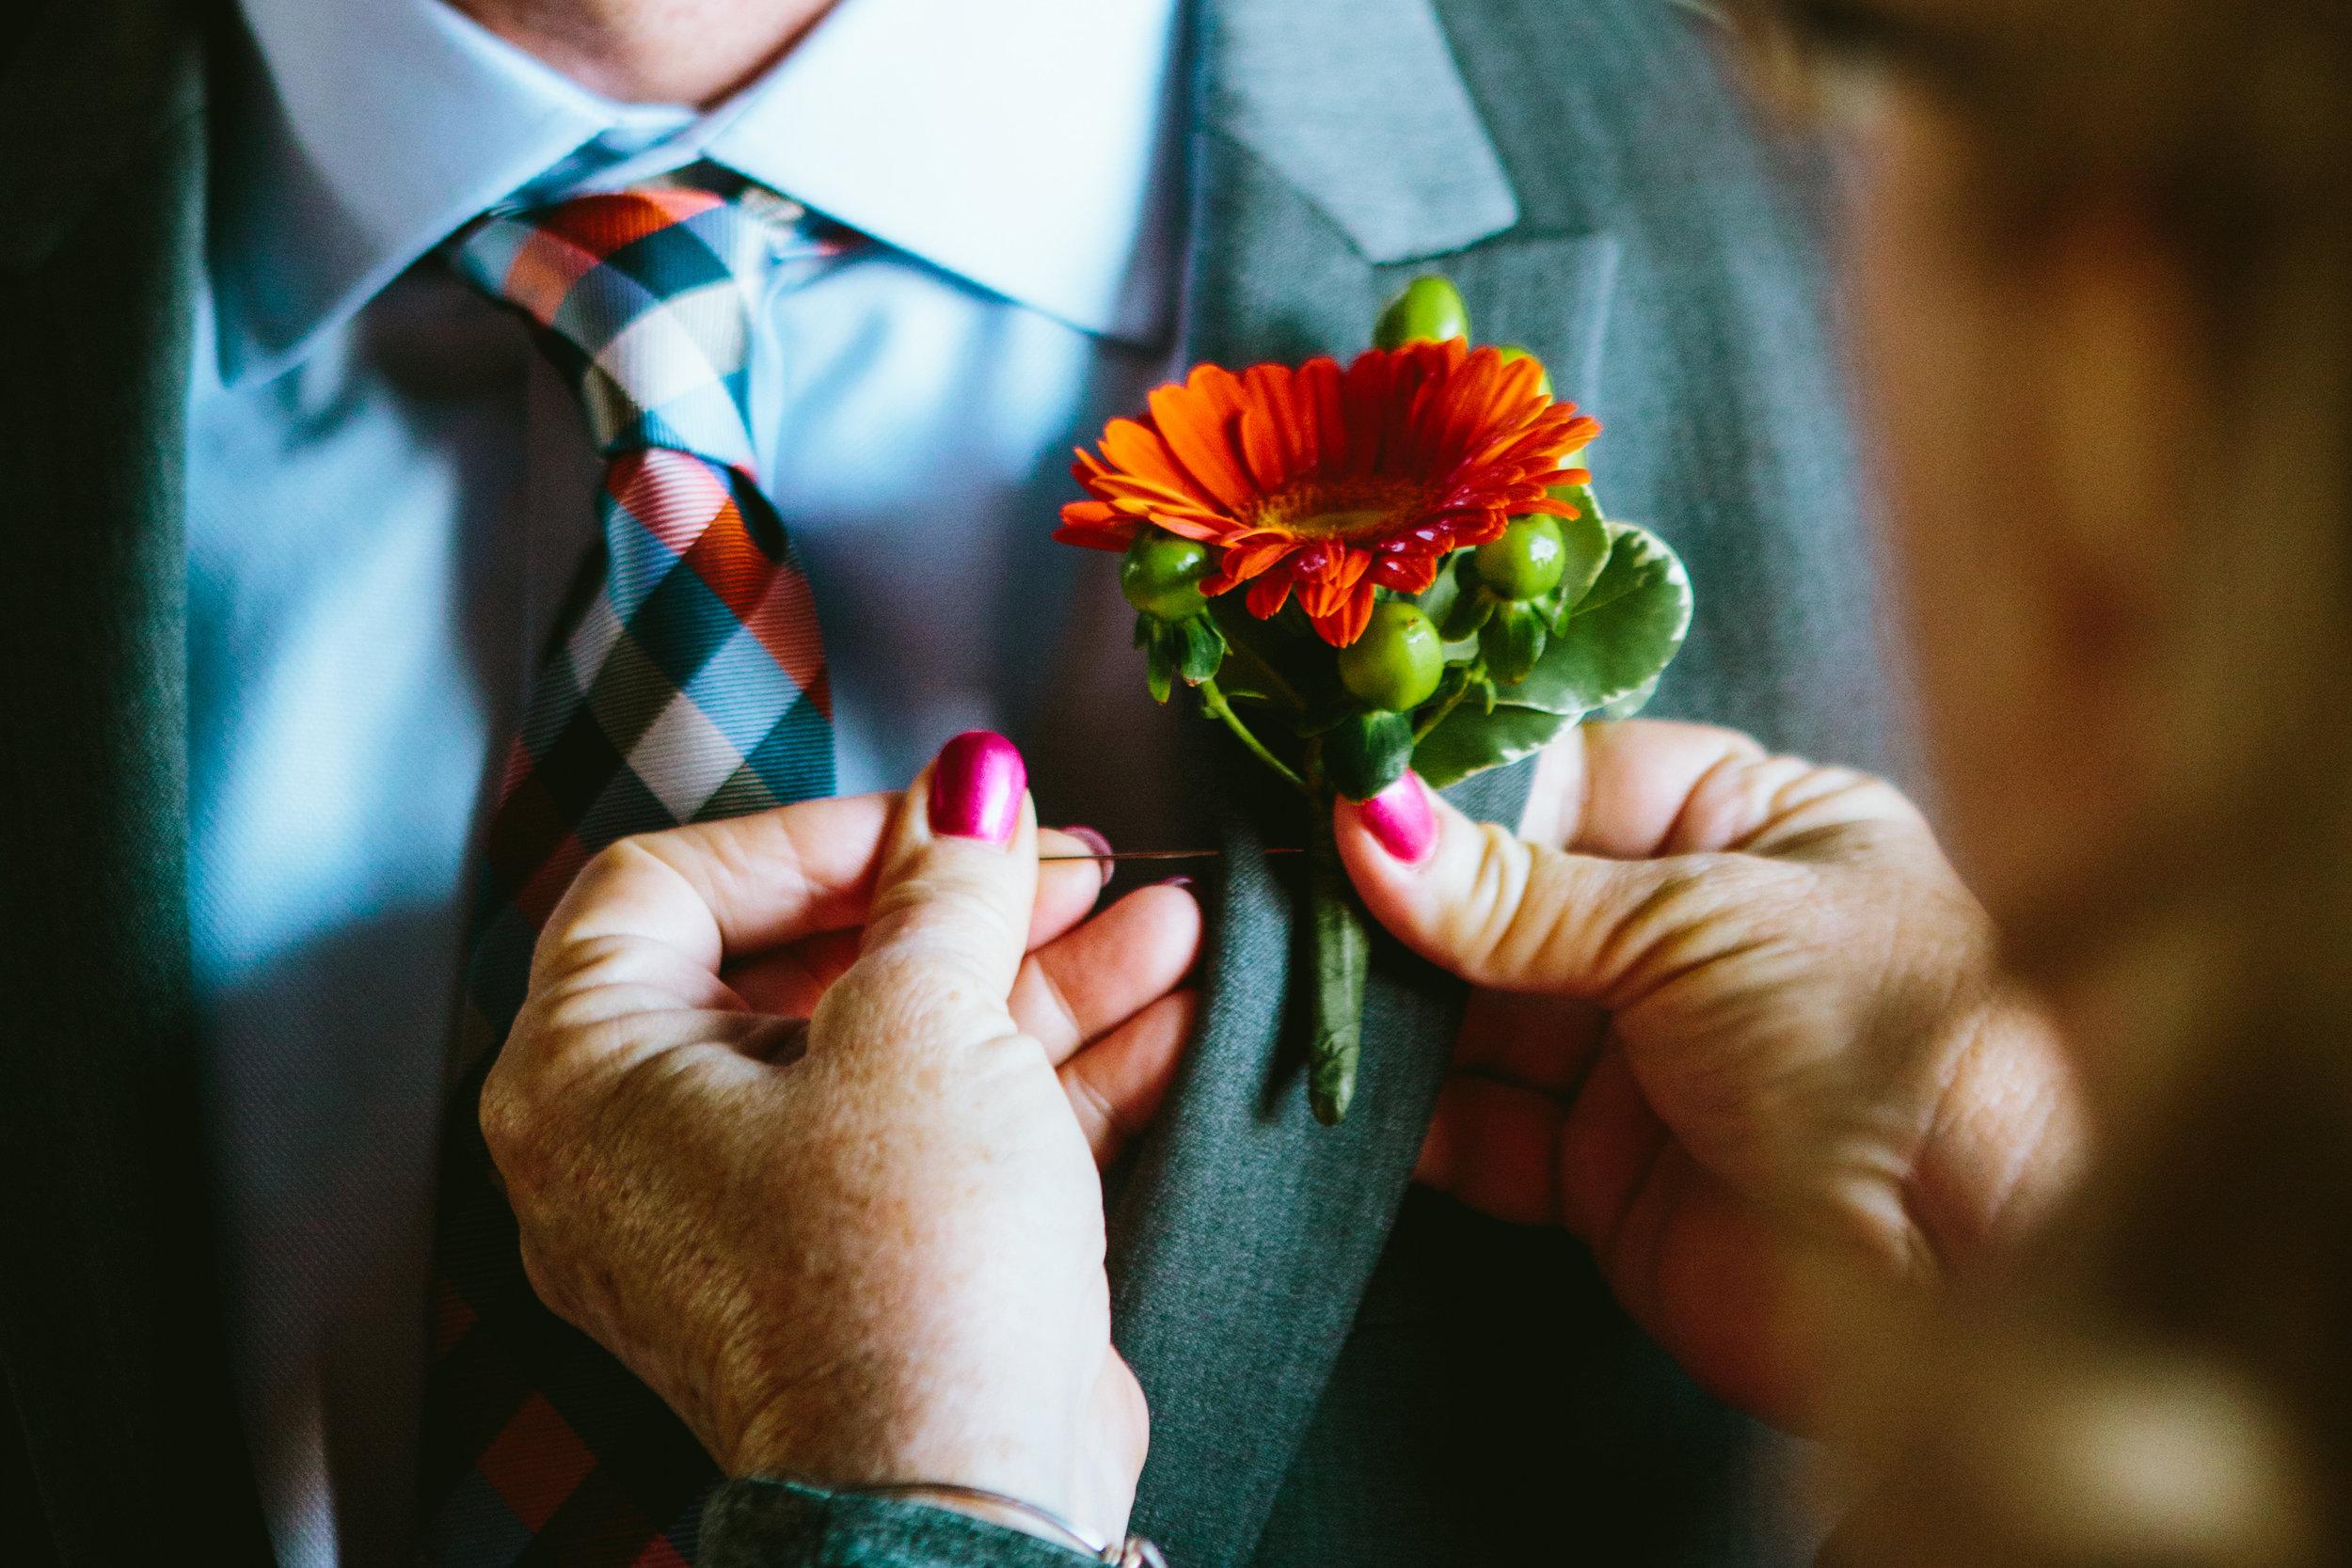 Whitesell-Mattioda Wedding-113.jpg